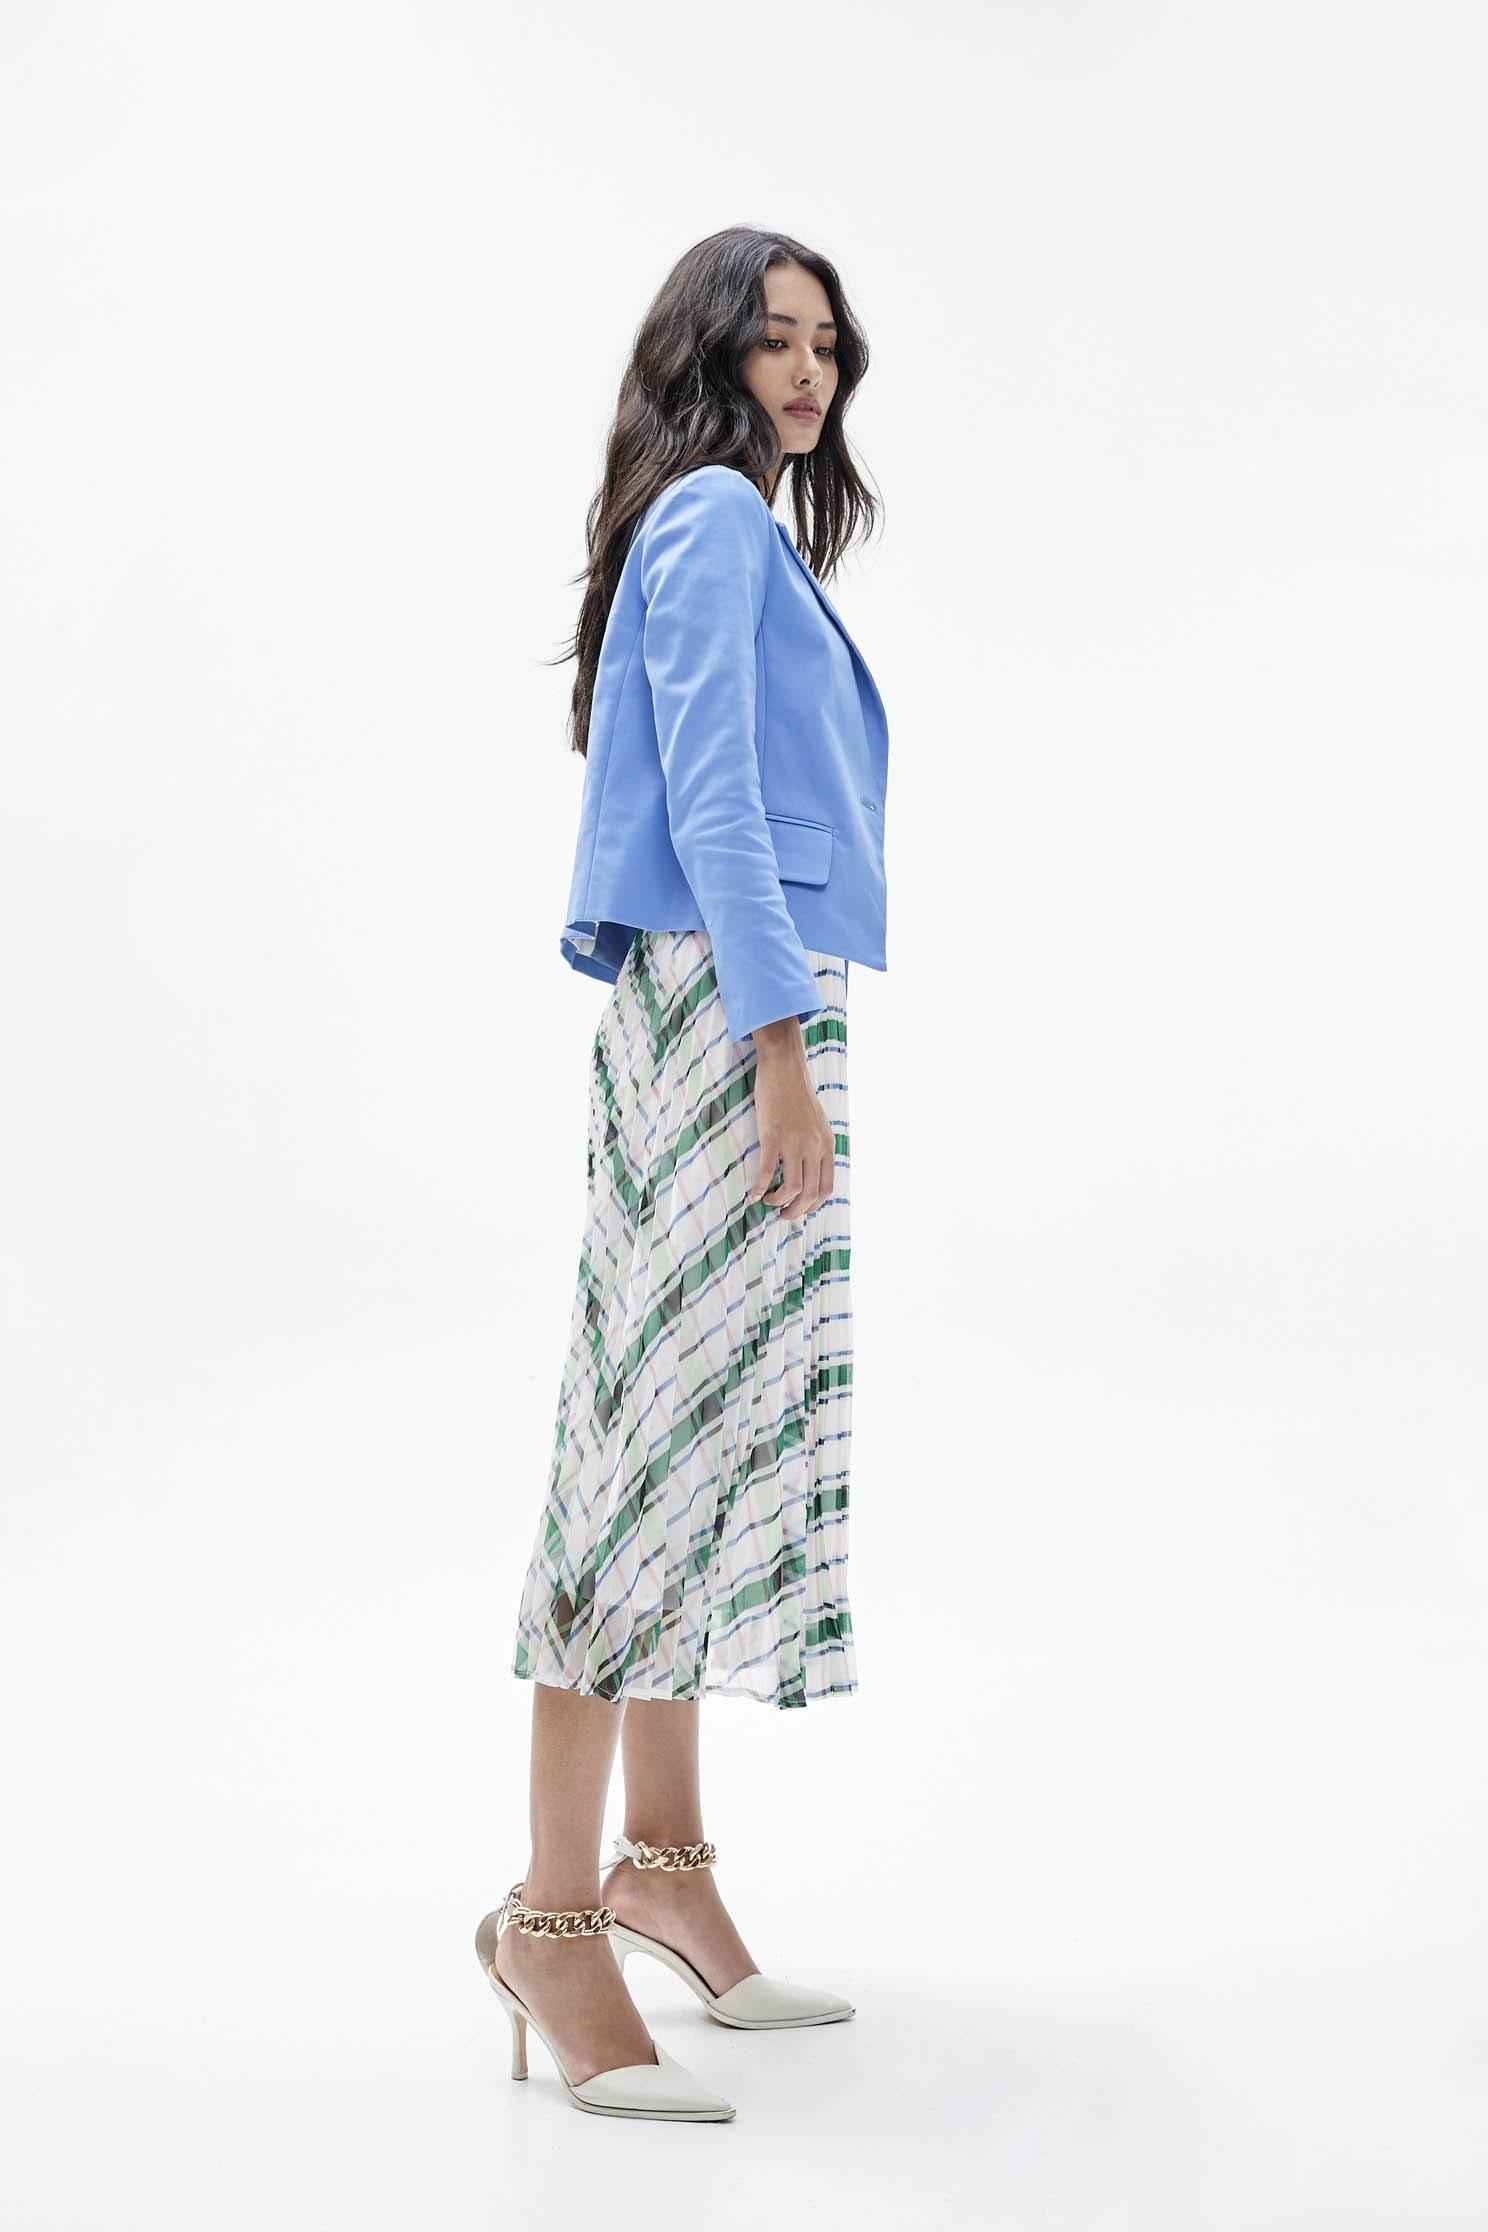 Sky blue short suit jacket,Outerwear,Season (SS) Look,Season (AW) Look,i Select,Blazers,Long sleeve outerwear